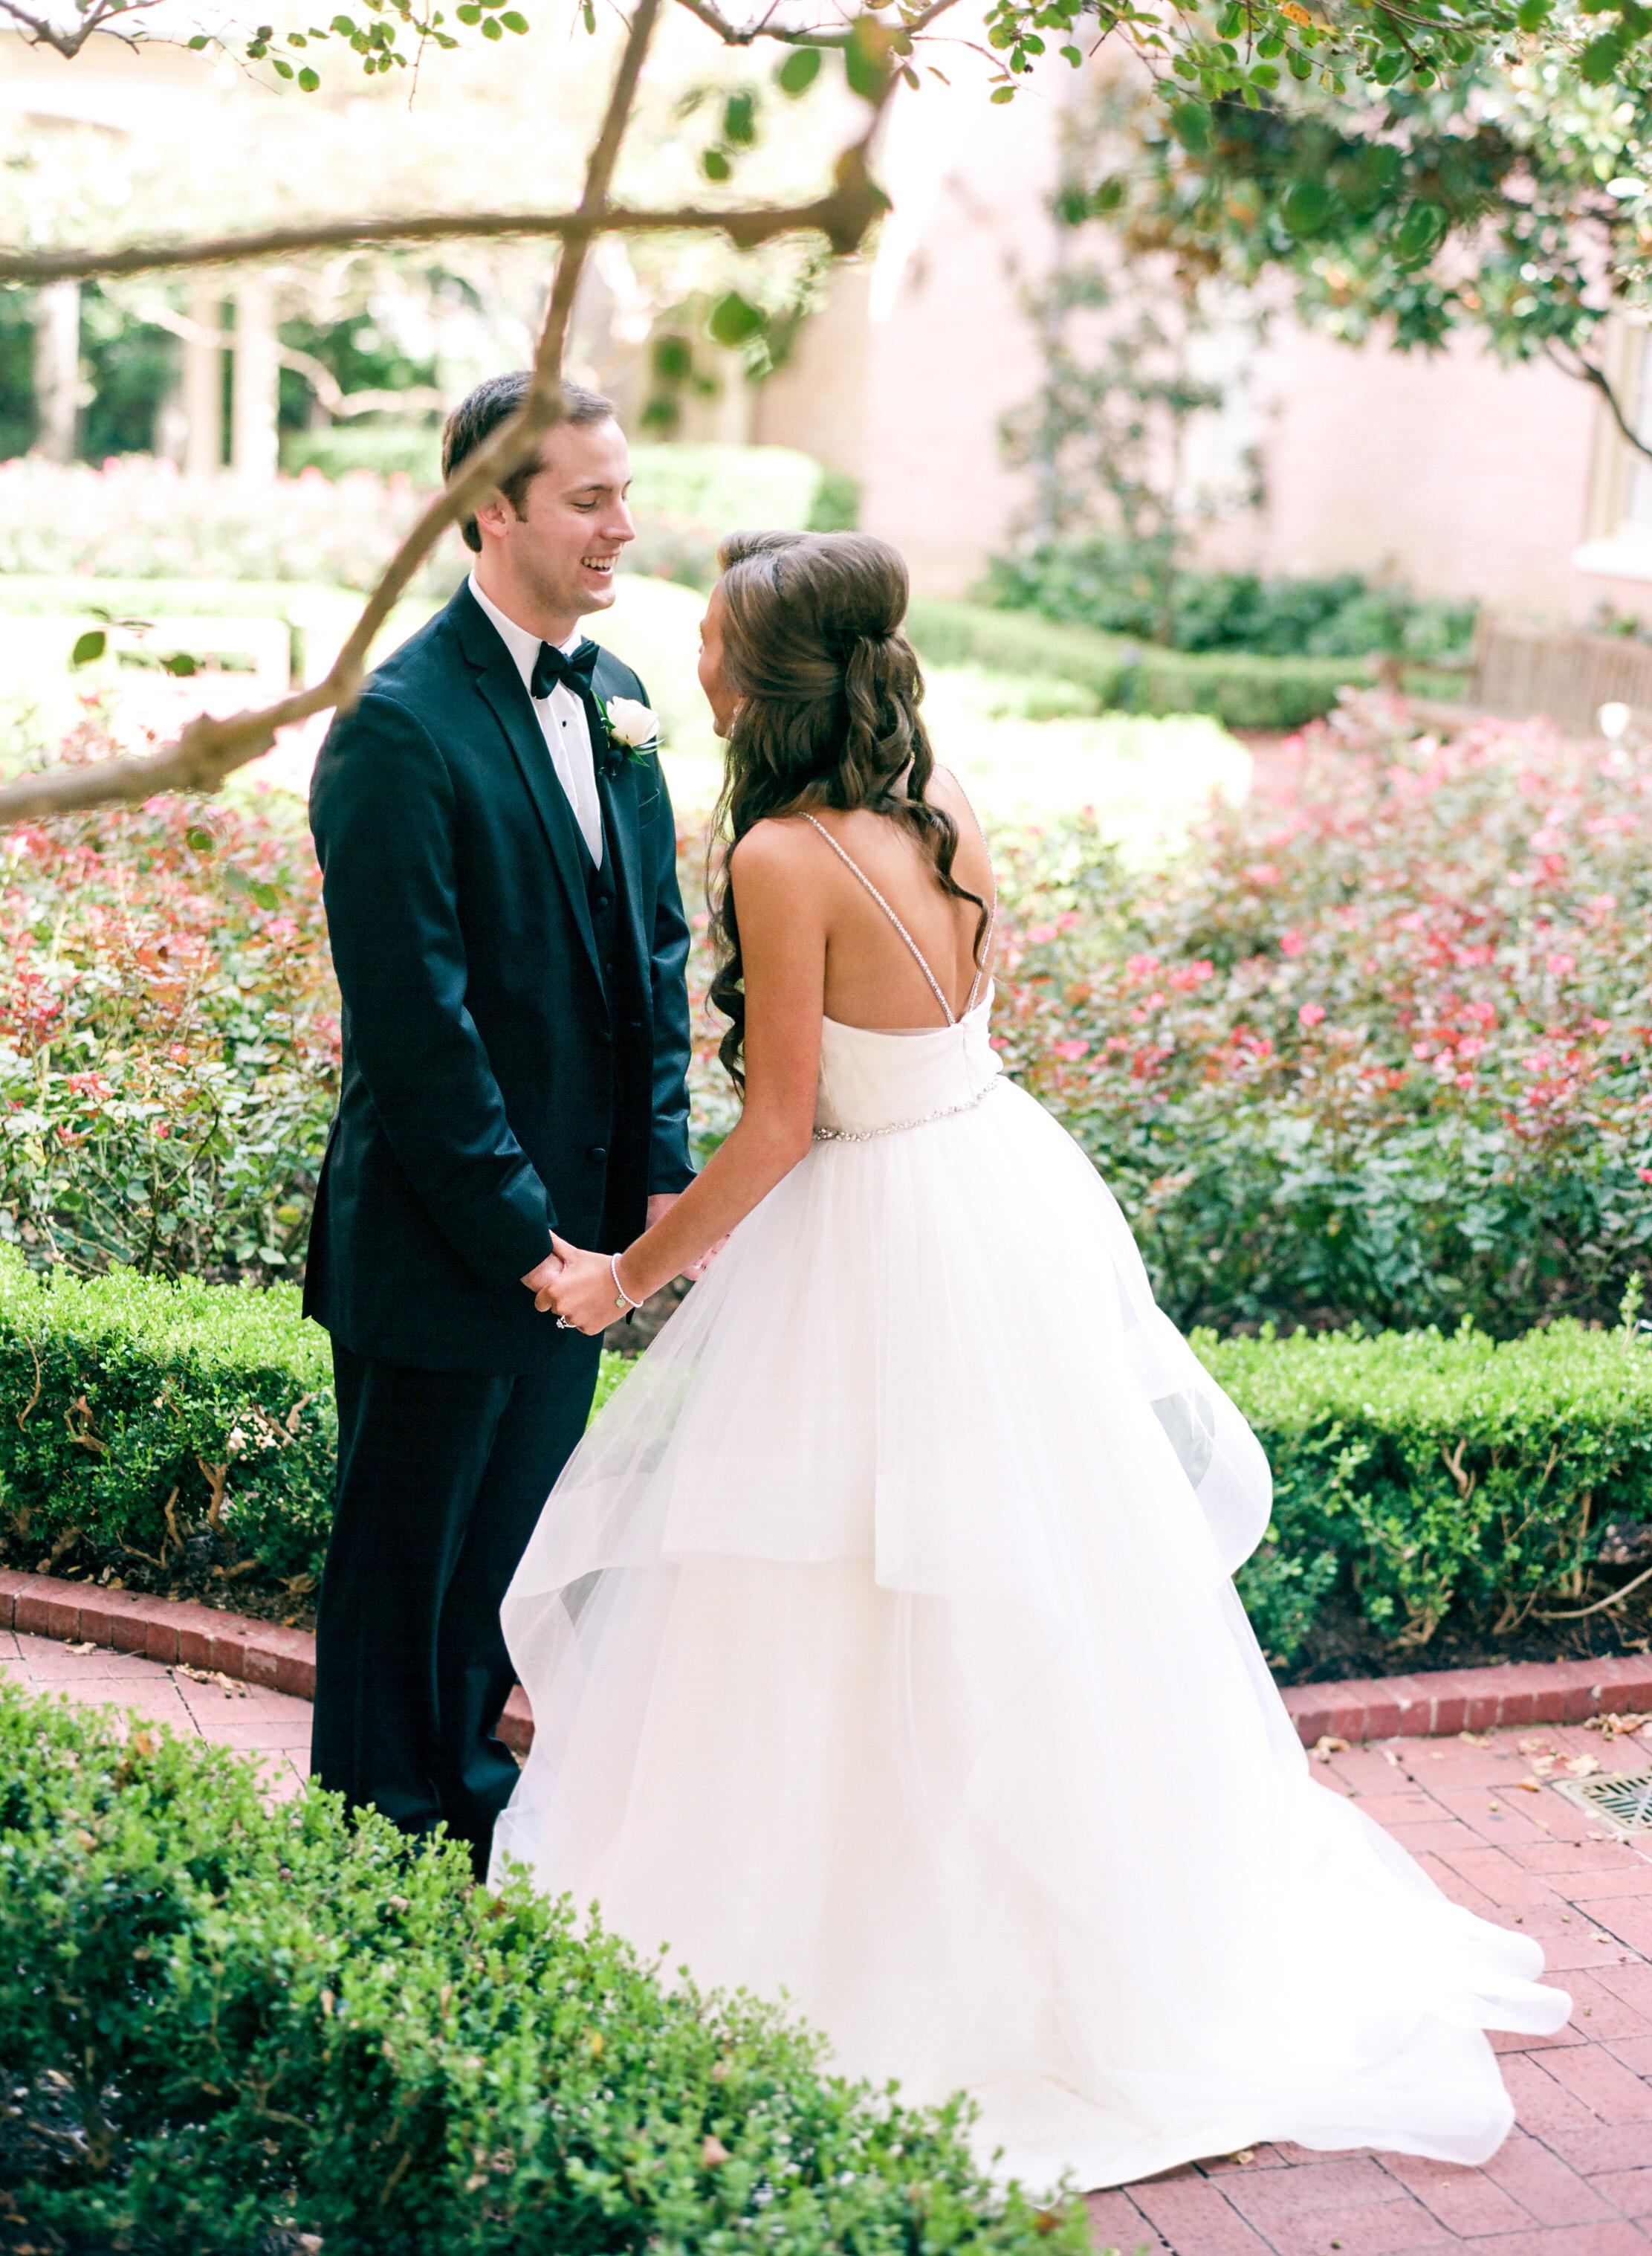 Dana-Fernandez-Photography-Weddings-in-Houston-Magazine-feature-Houston-wedding-photographer-film-23.jpg